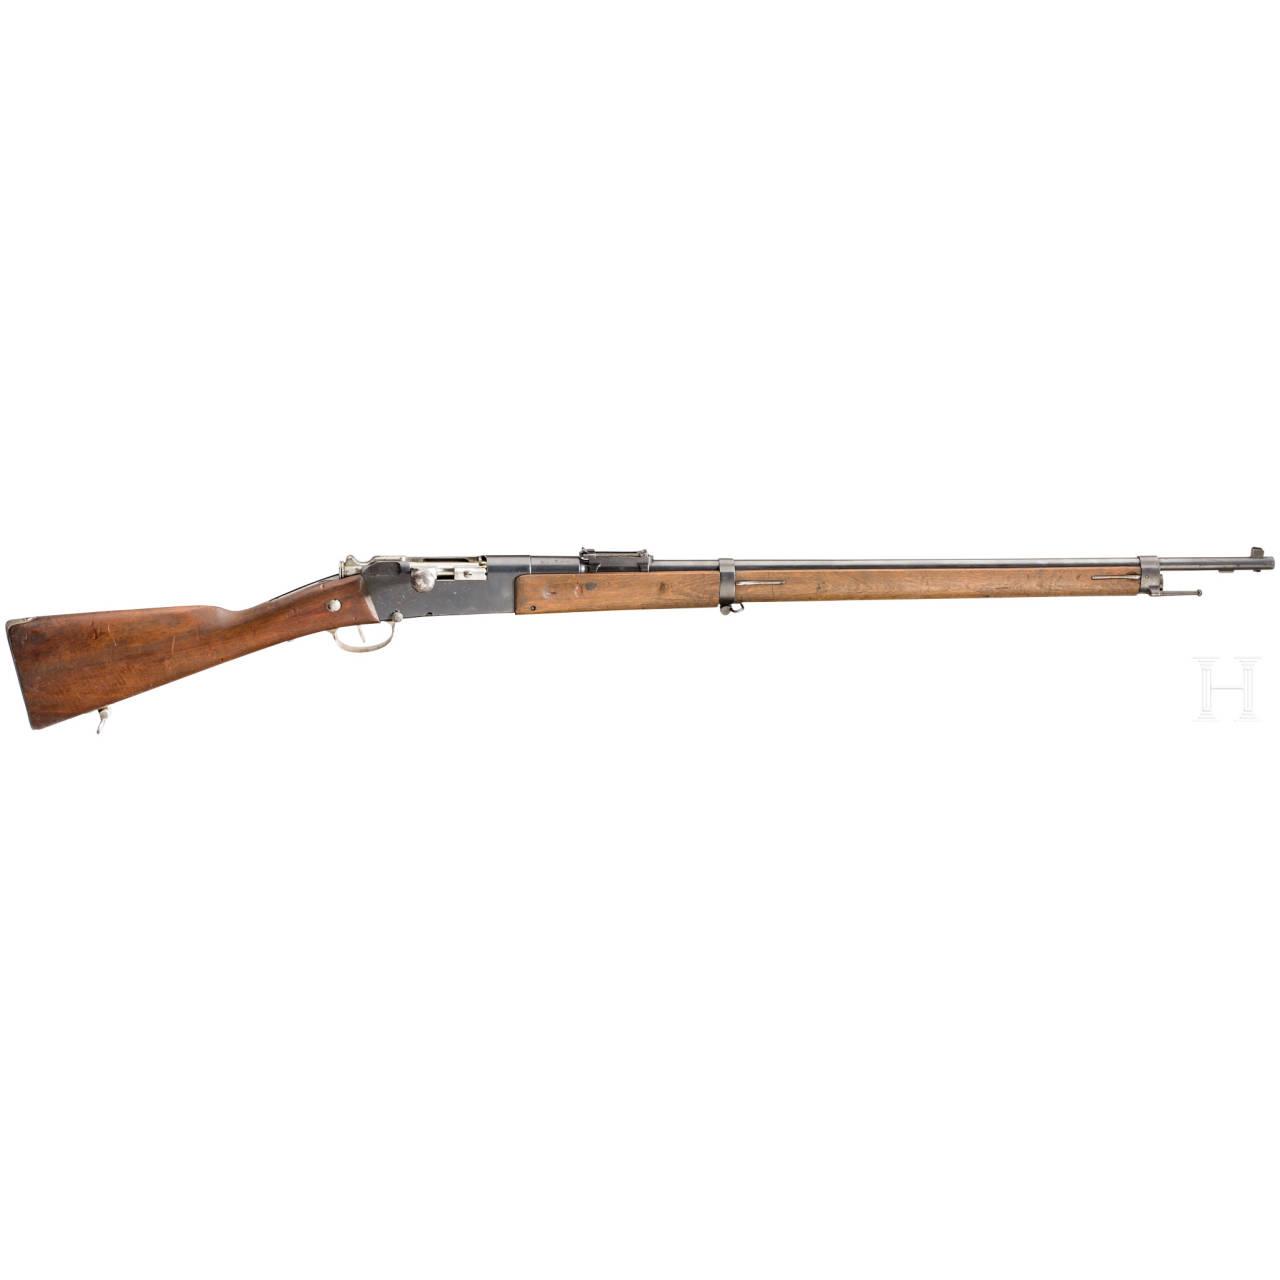 Fusil Lebel Mle 1886 M 93